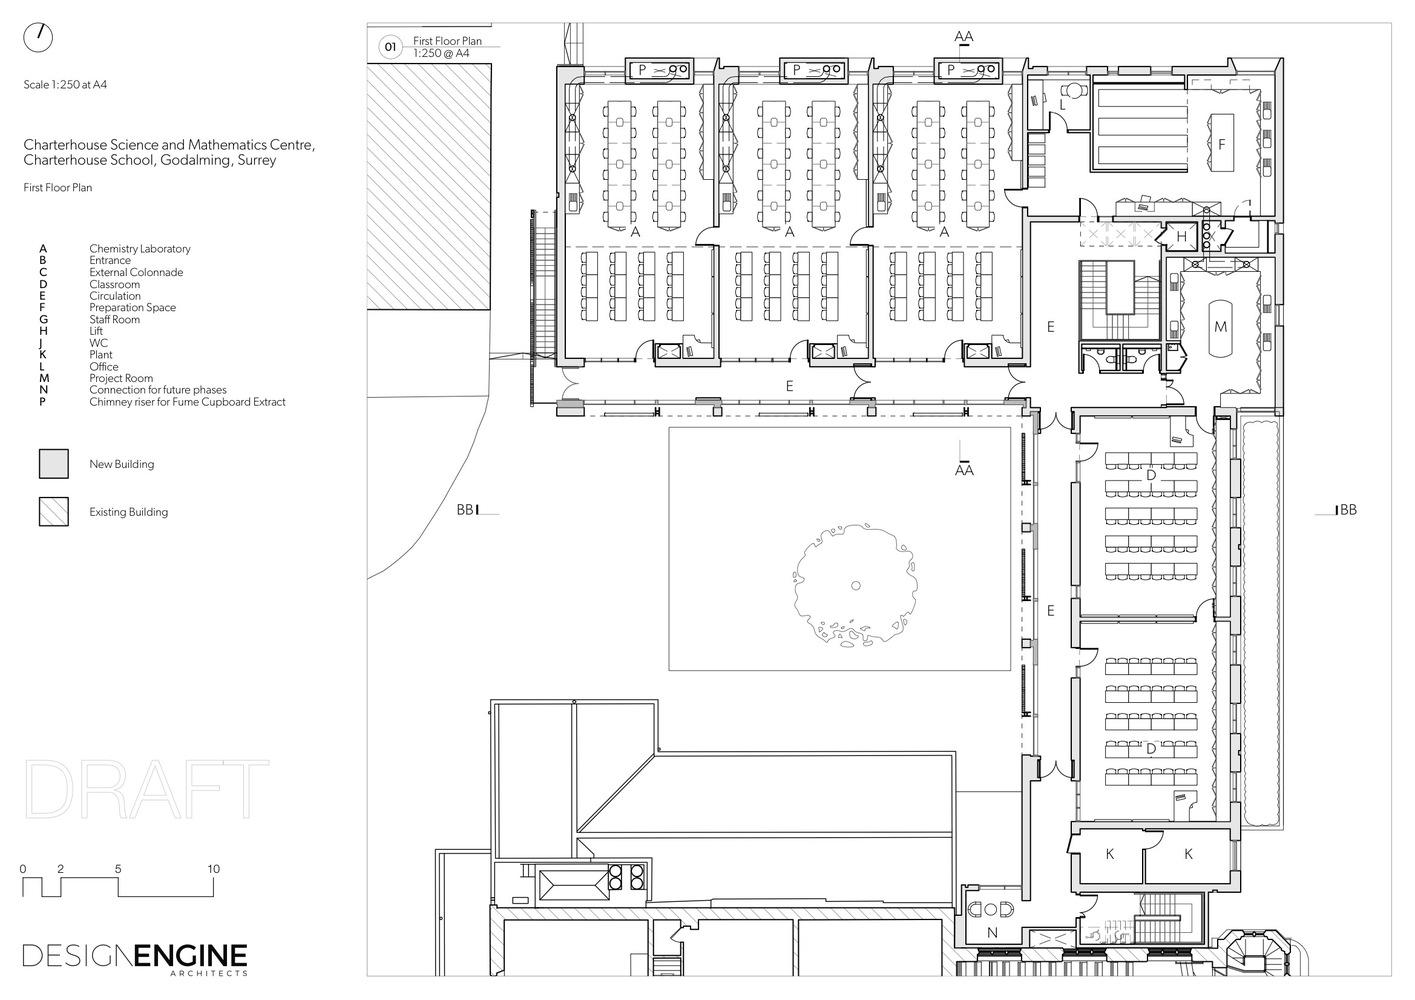 charterhouse science mathematics centre design engine architects first floor plan [ 1415 x 1000 Pixel ]